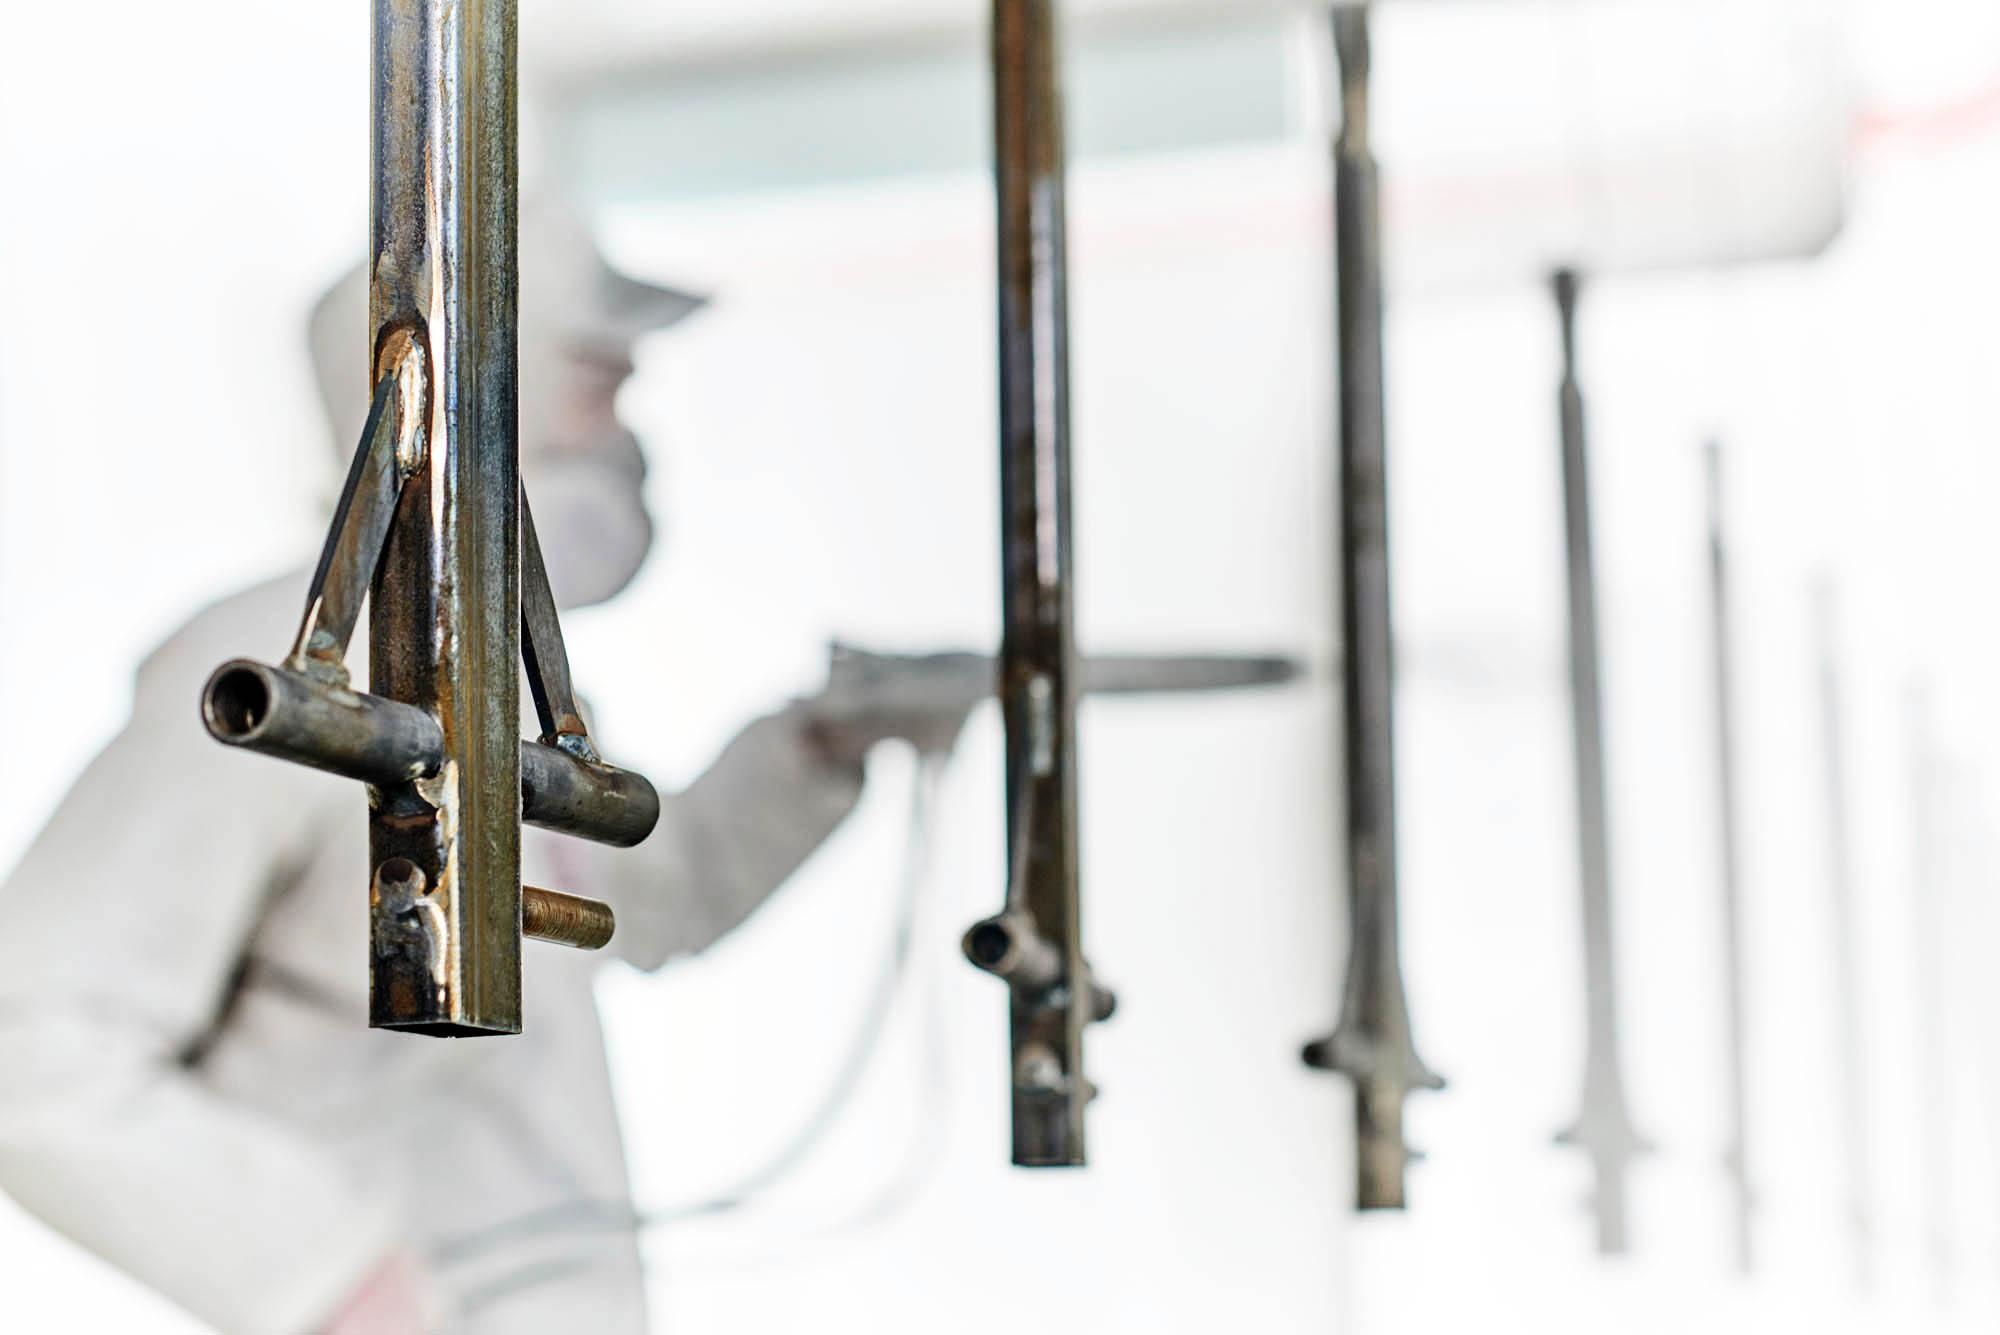 OPC 161220 14816 1 - Jud Metallbearbeitung: Moderne Industriefotografie